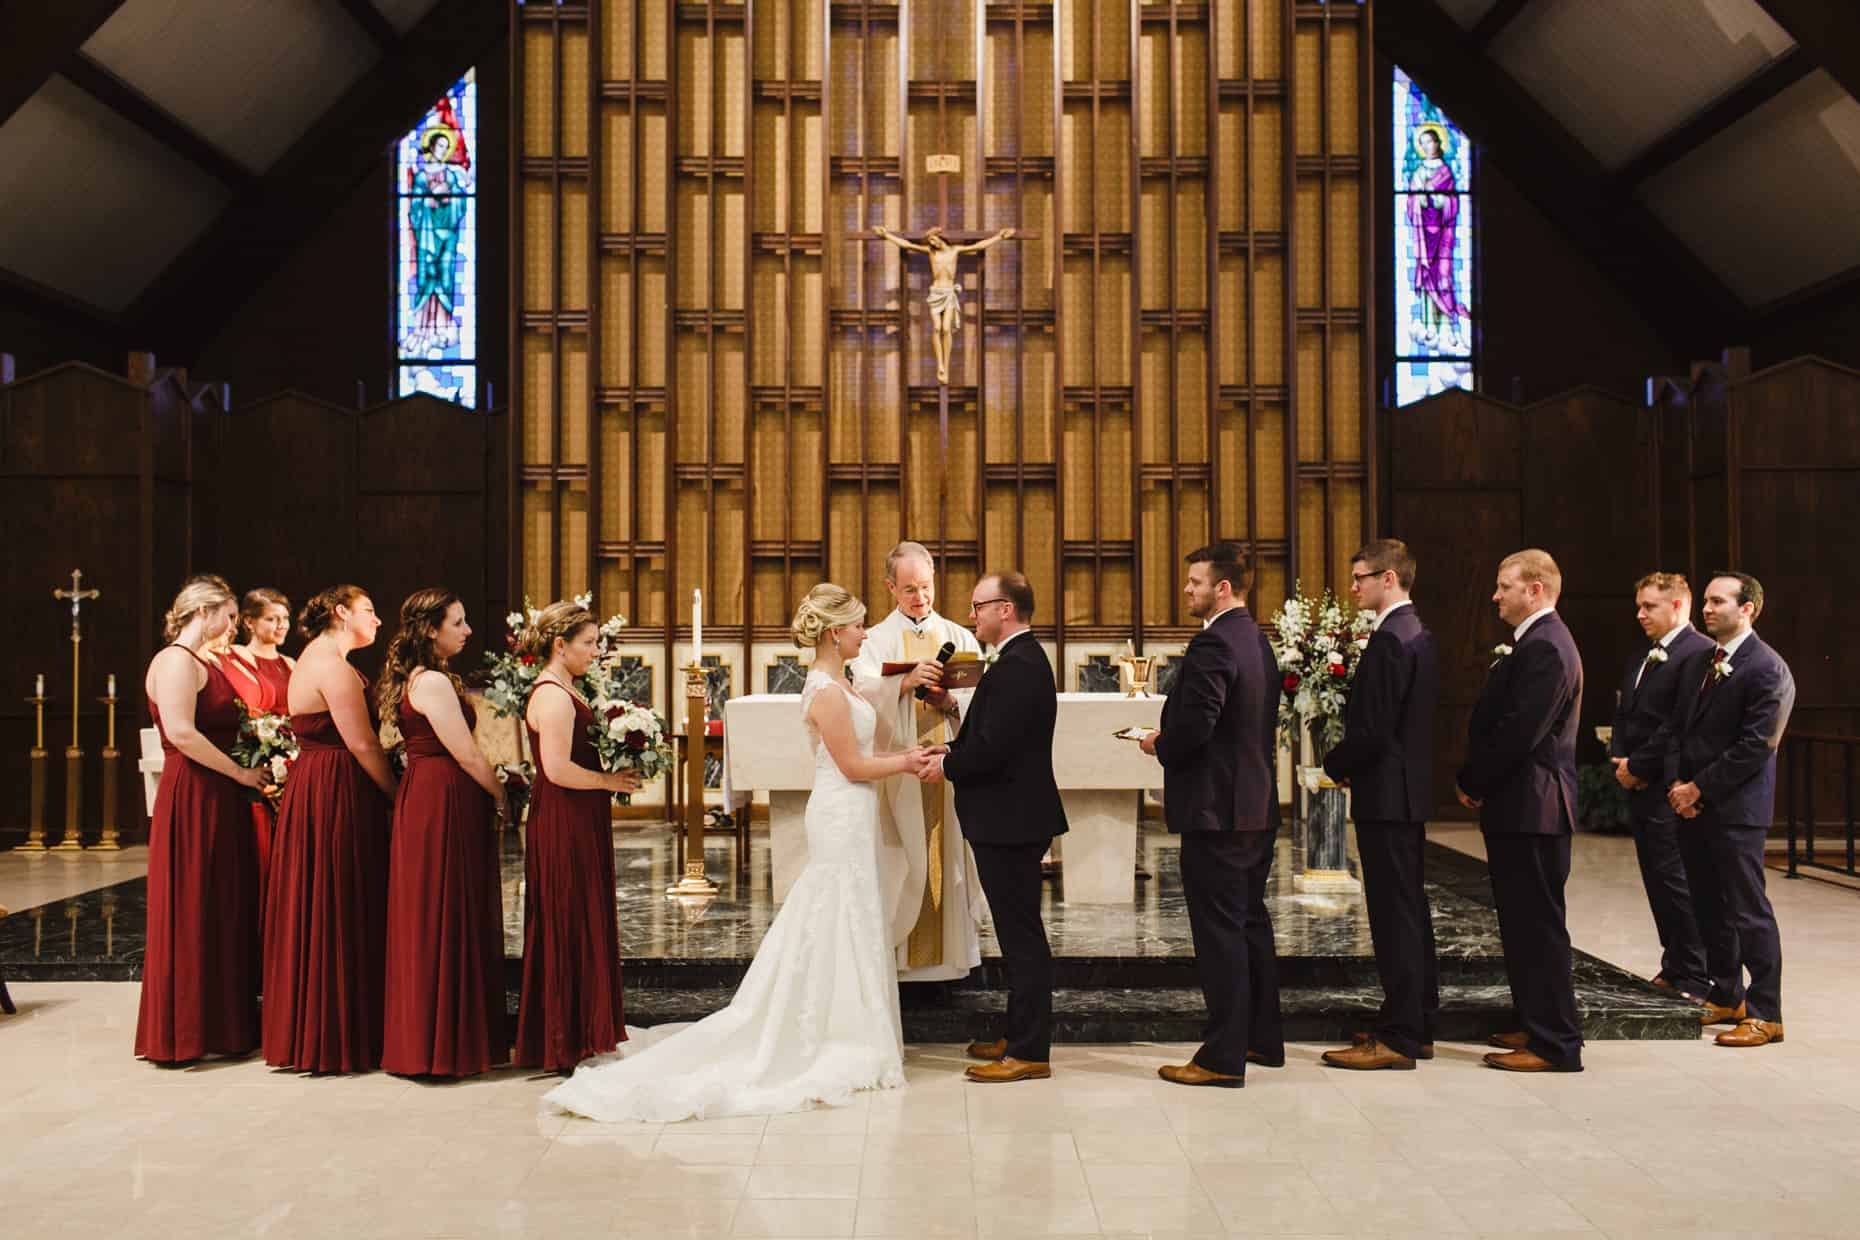 Wedding Photographers Delaware Center for Horticulture